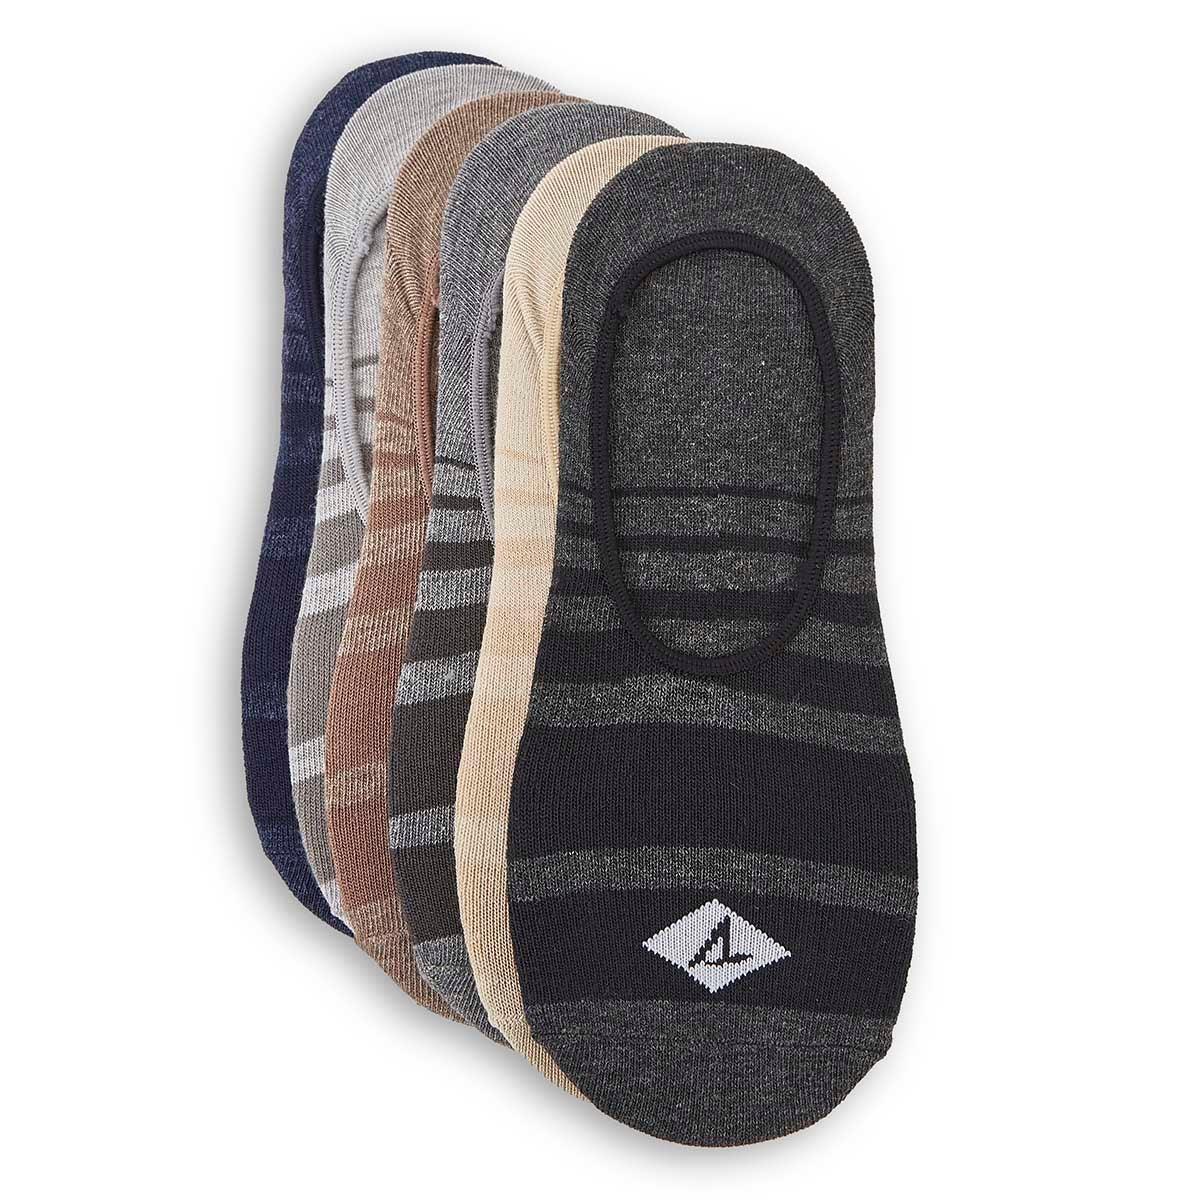 Mns Shadow Stripe blk hthr mlt sock-6 pk